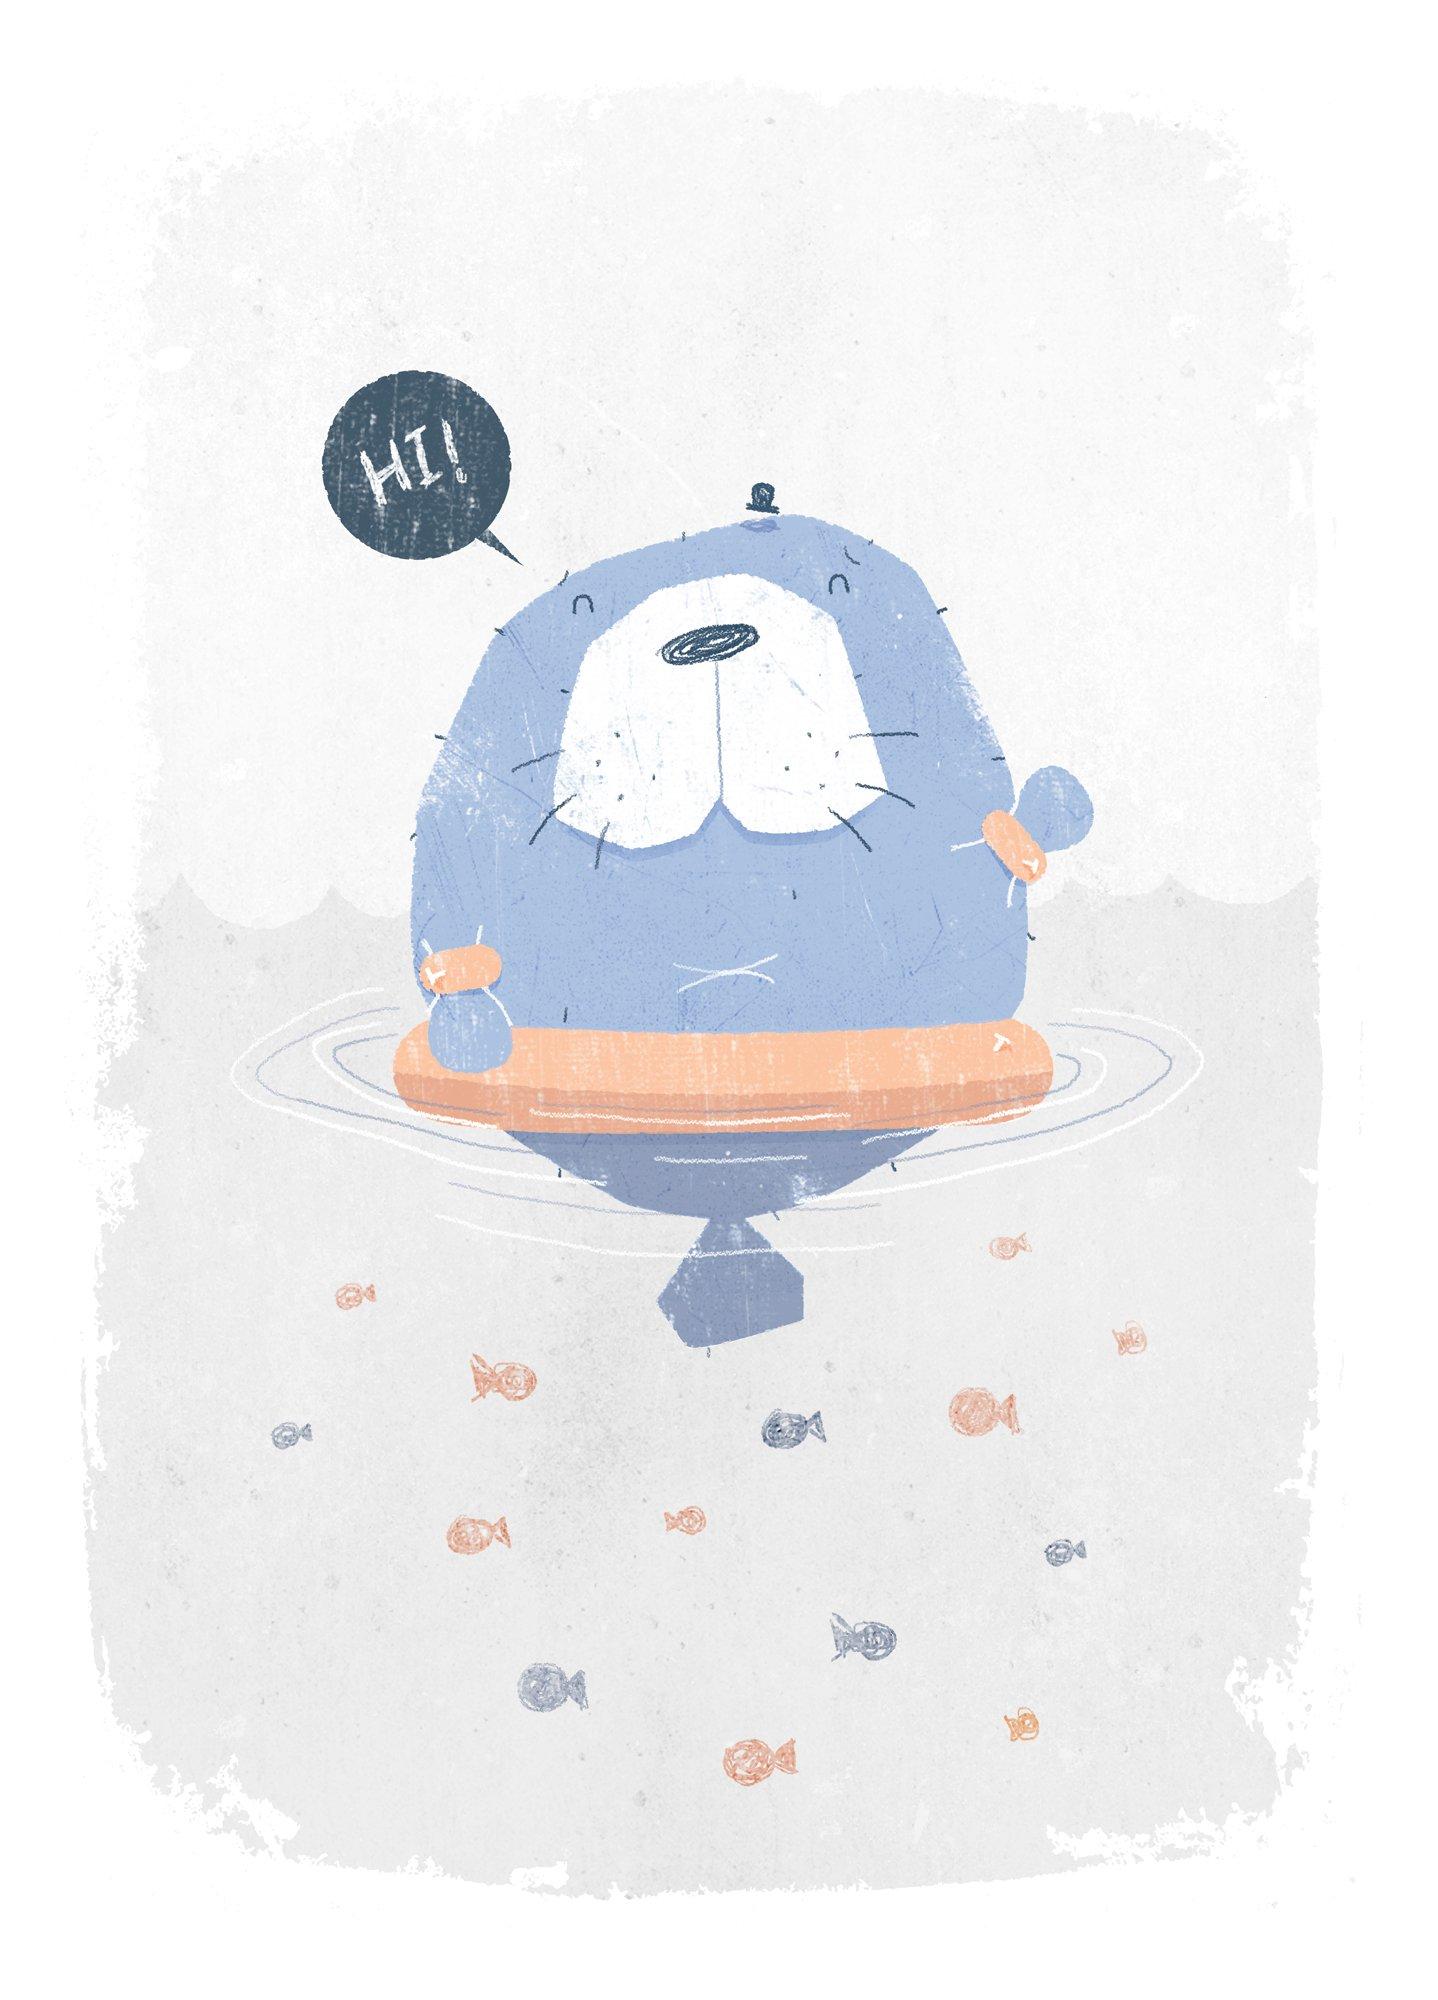 Cute Manatee Illustration -7-smaller